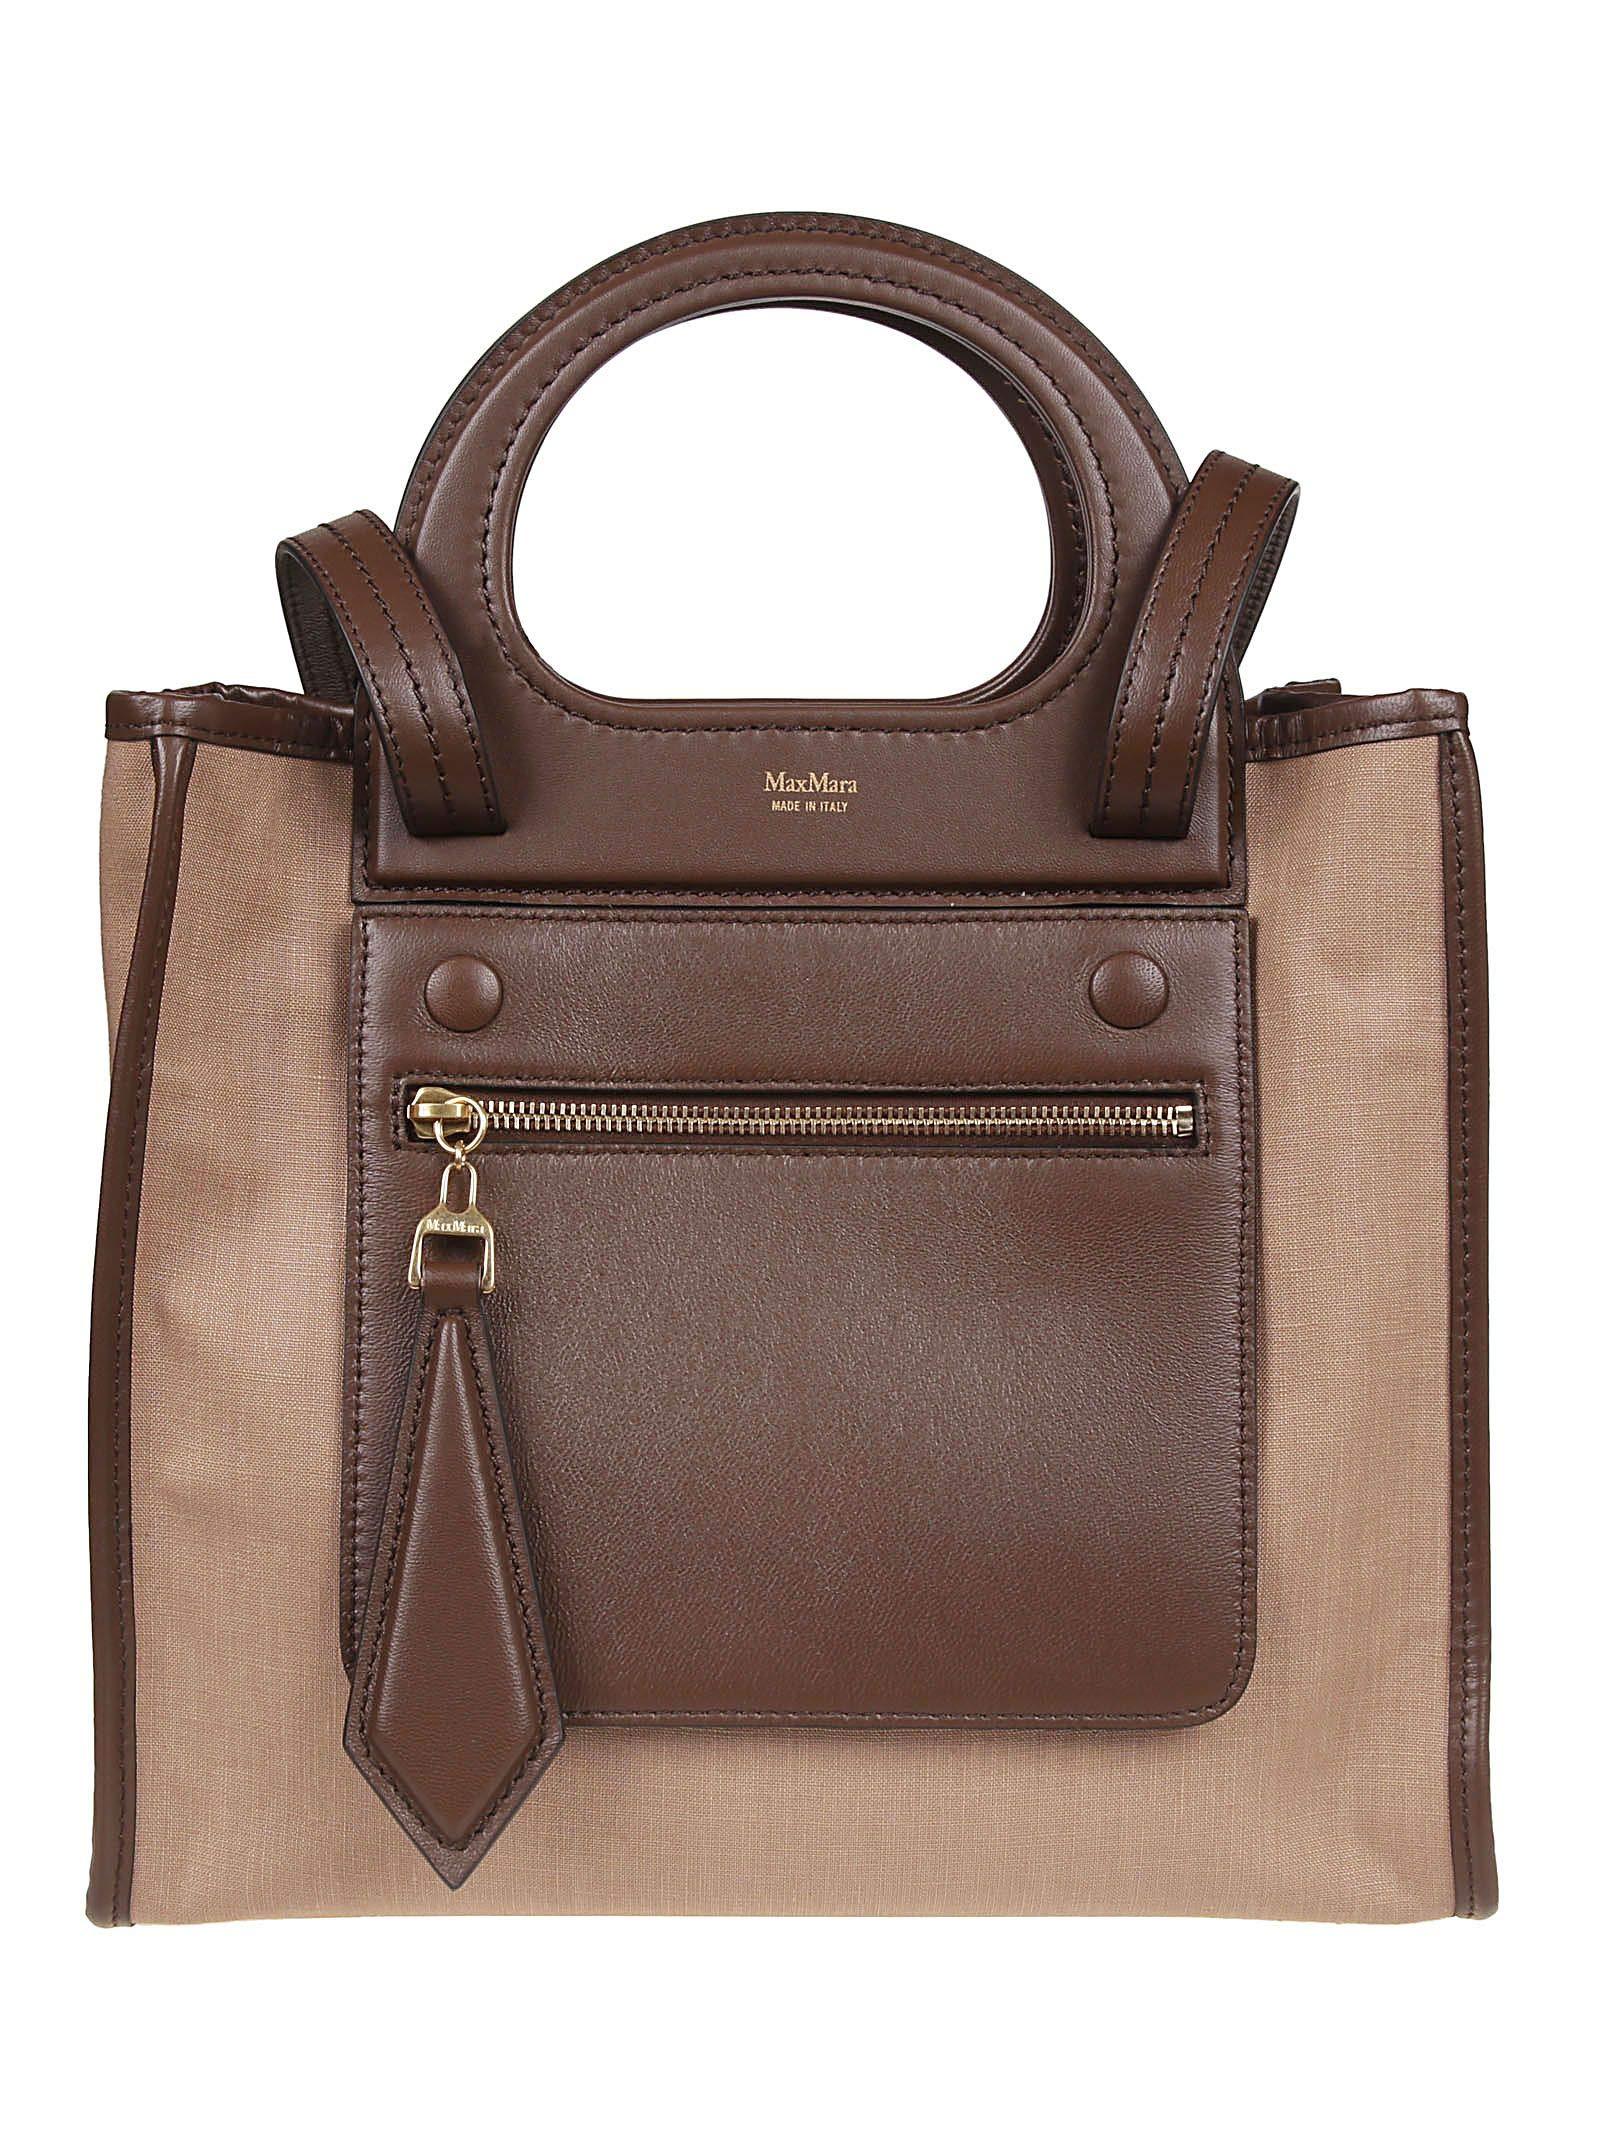 Max Mara Women's 45112091600008 Brown Leather Tote